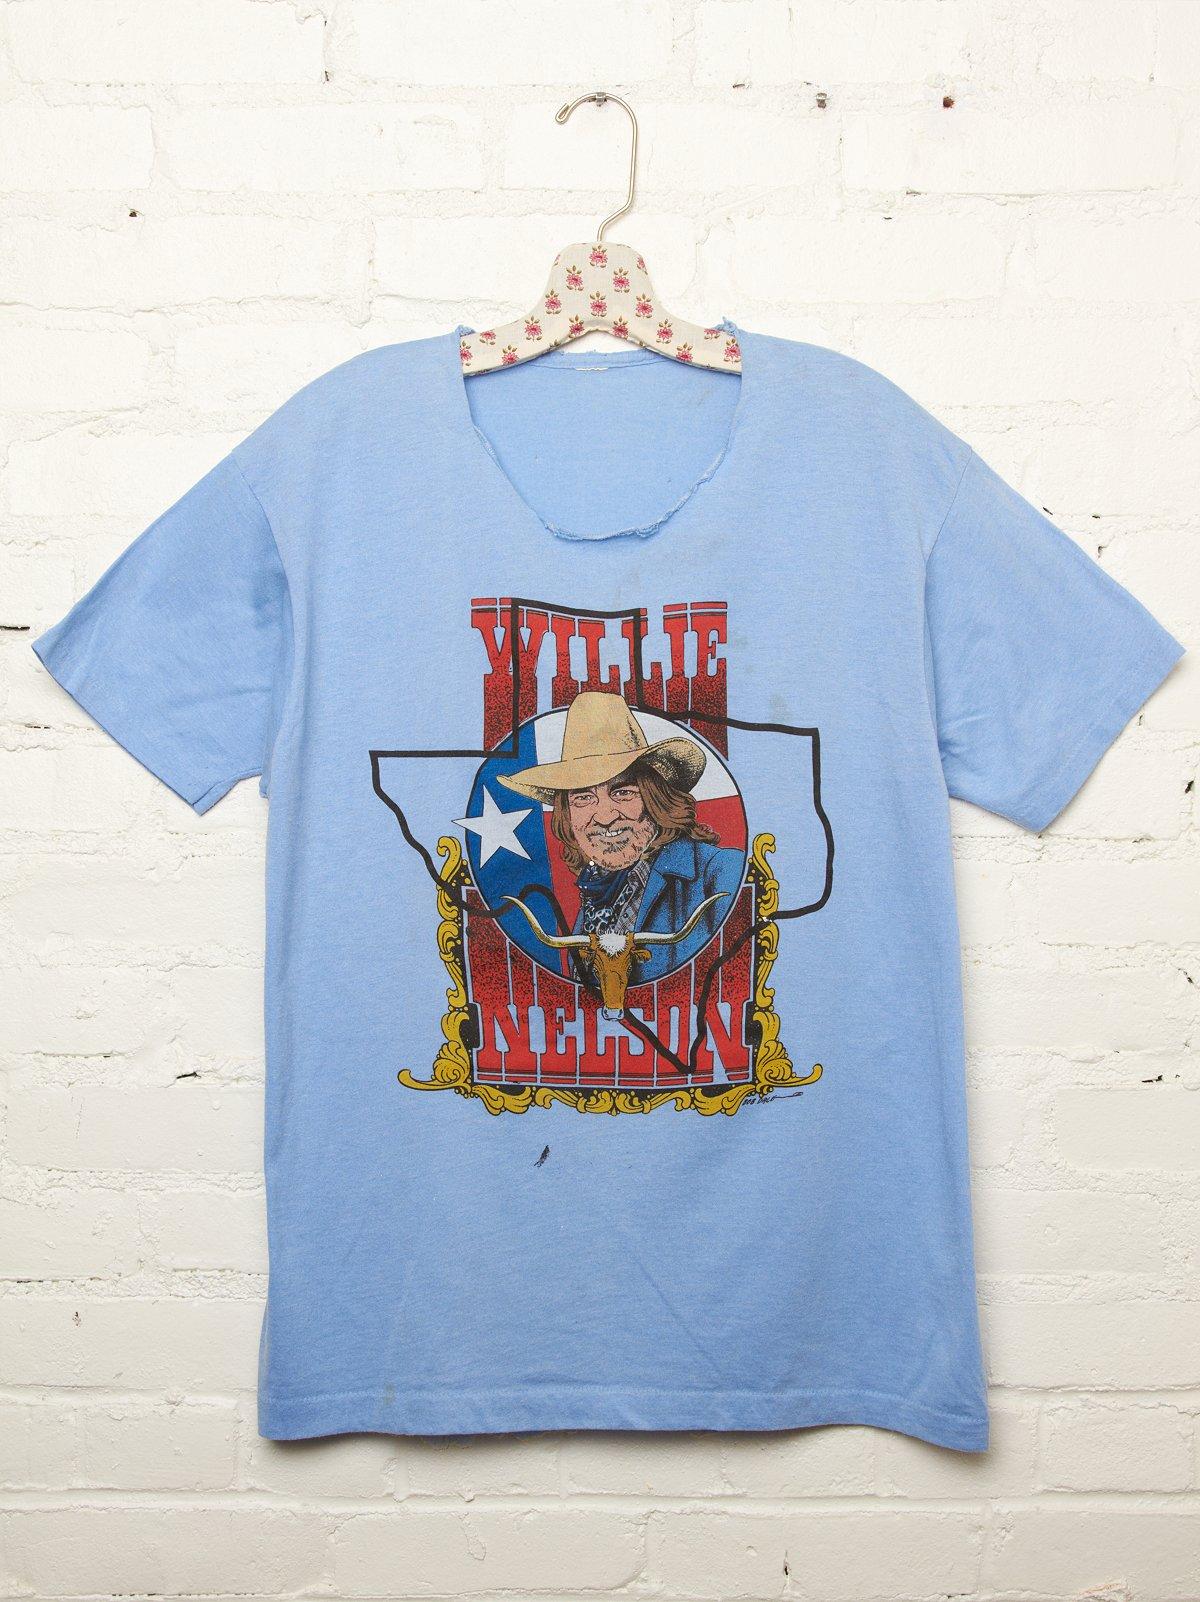 Vintage Willie Nelson Tee